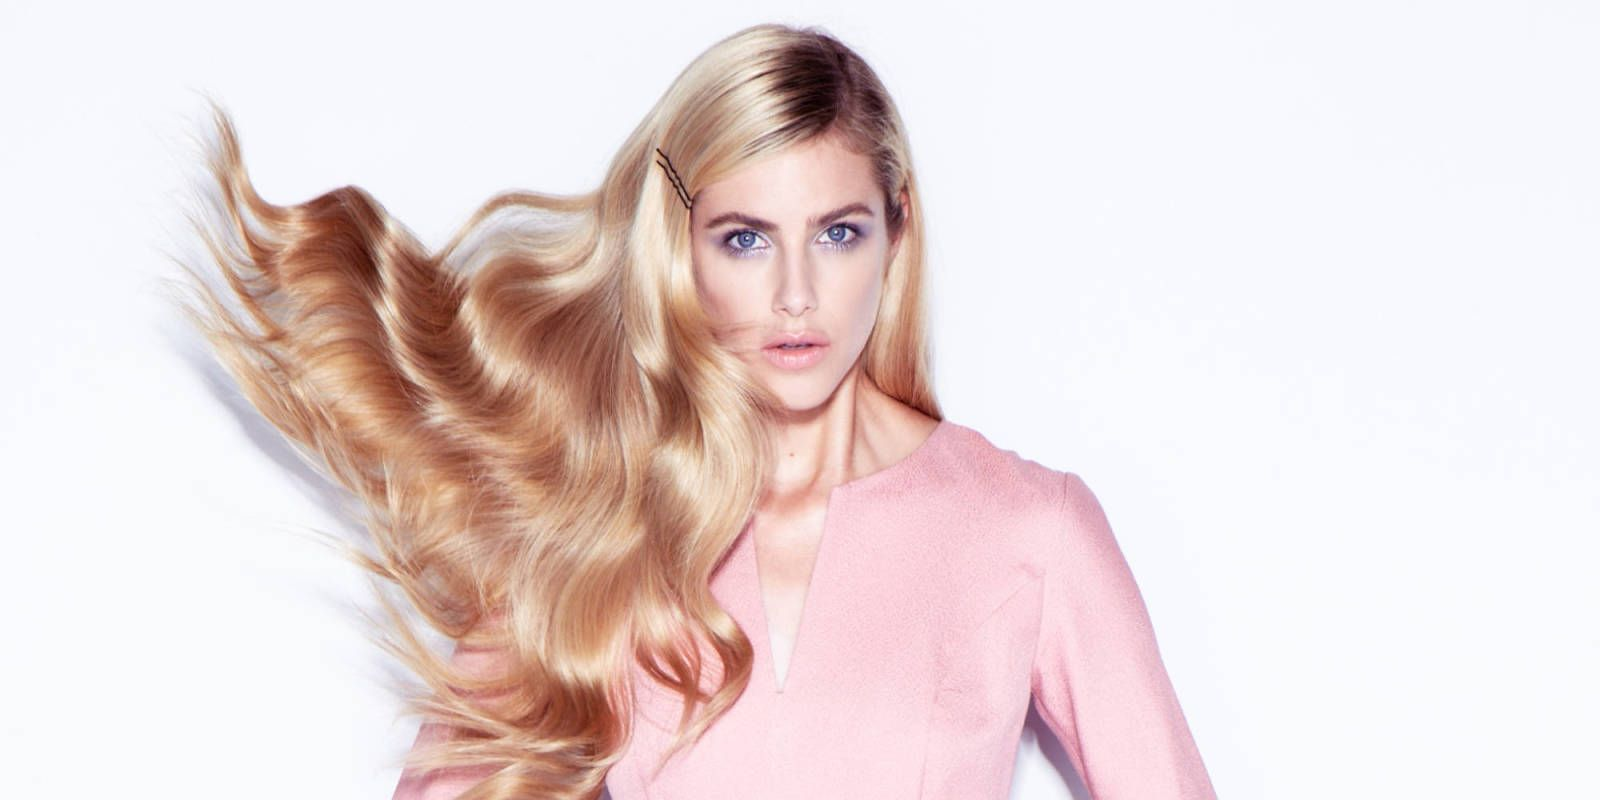 Glossy perfect hair -Cosmopolitan.co.uk